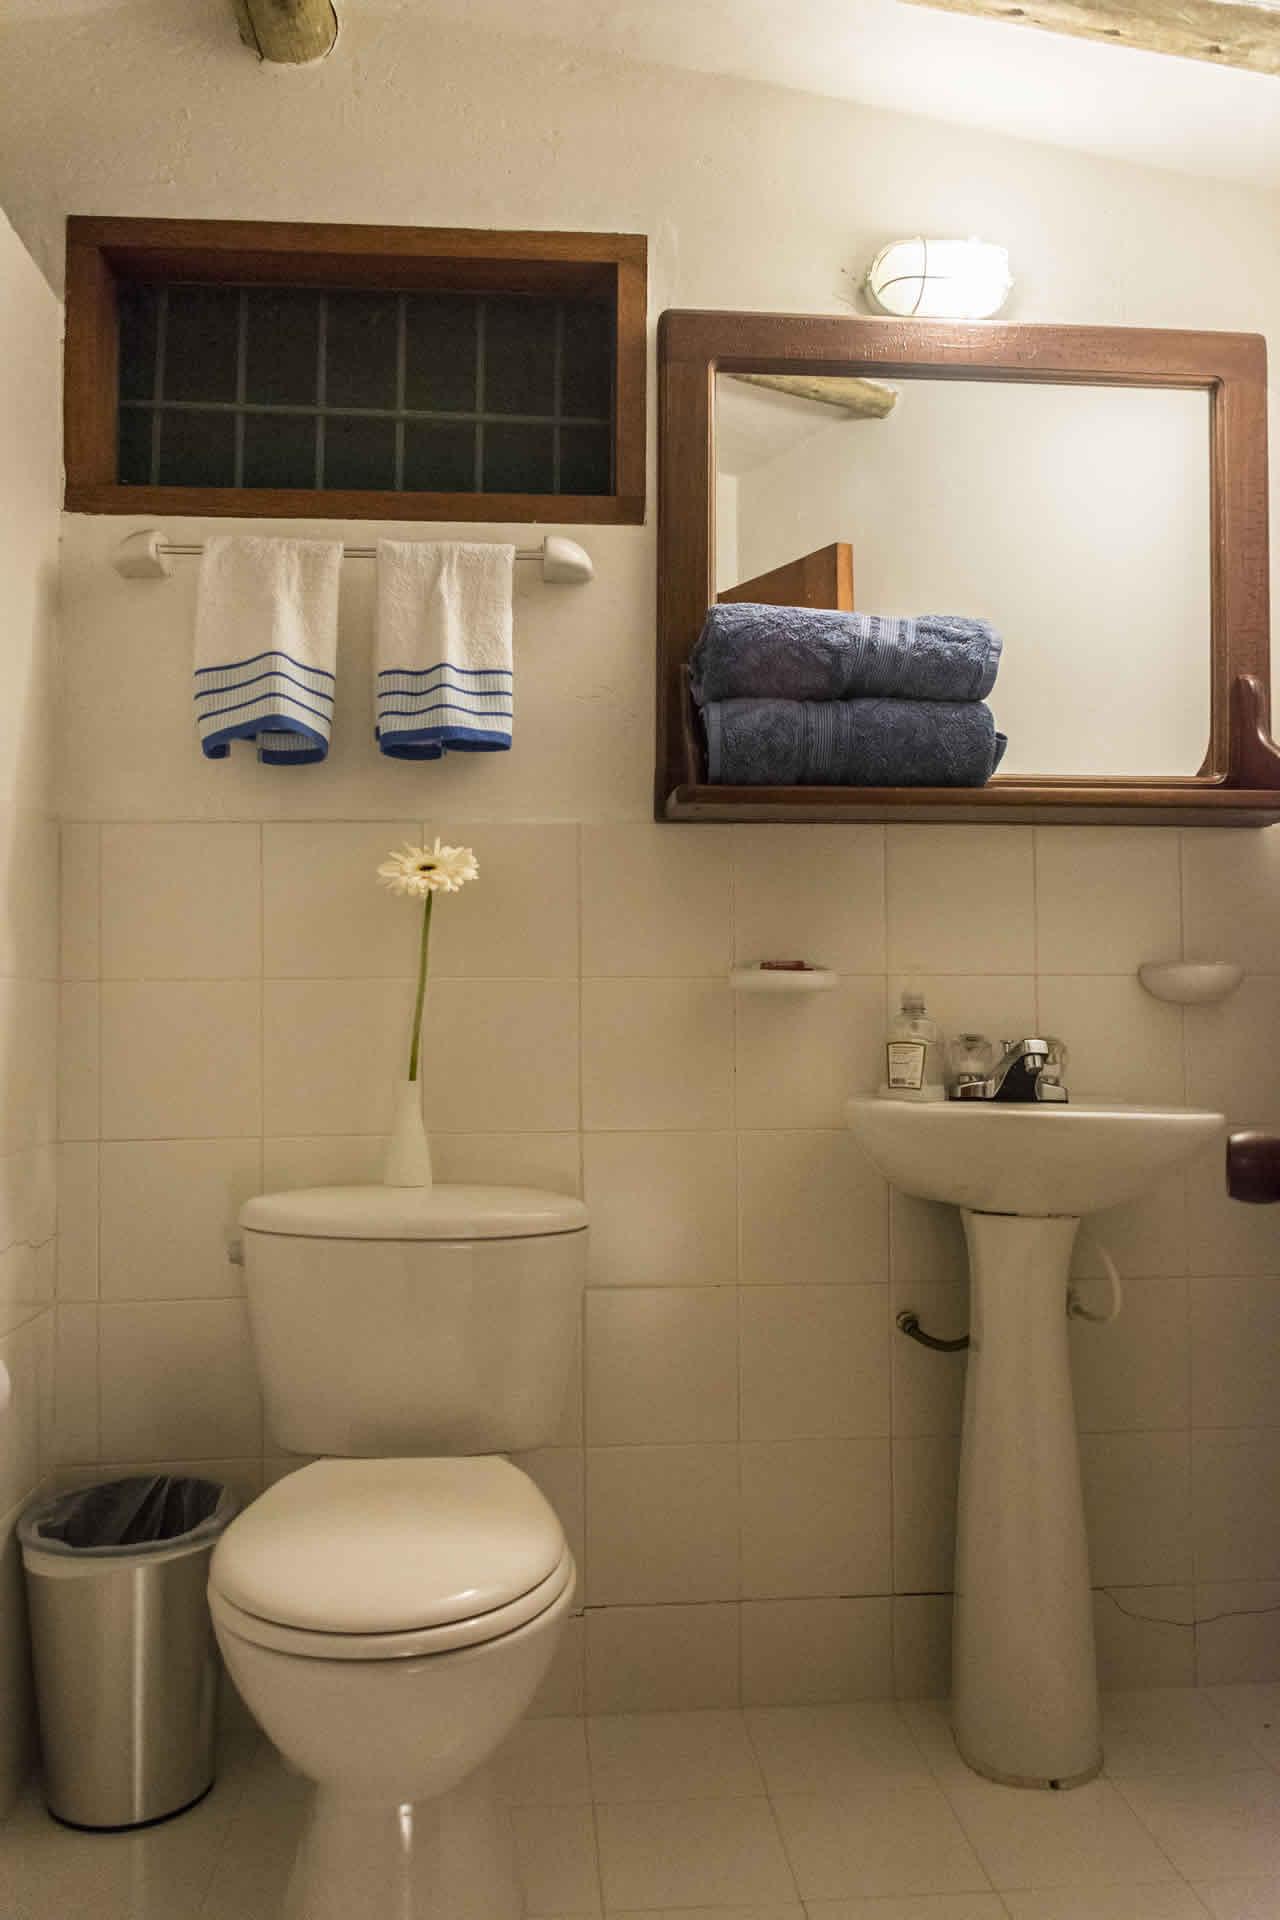 Suites Maloka 2 en Villa de Leyva - Baño